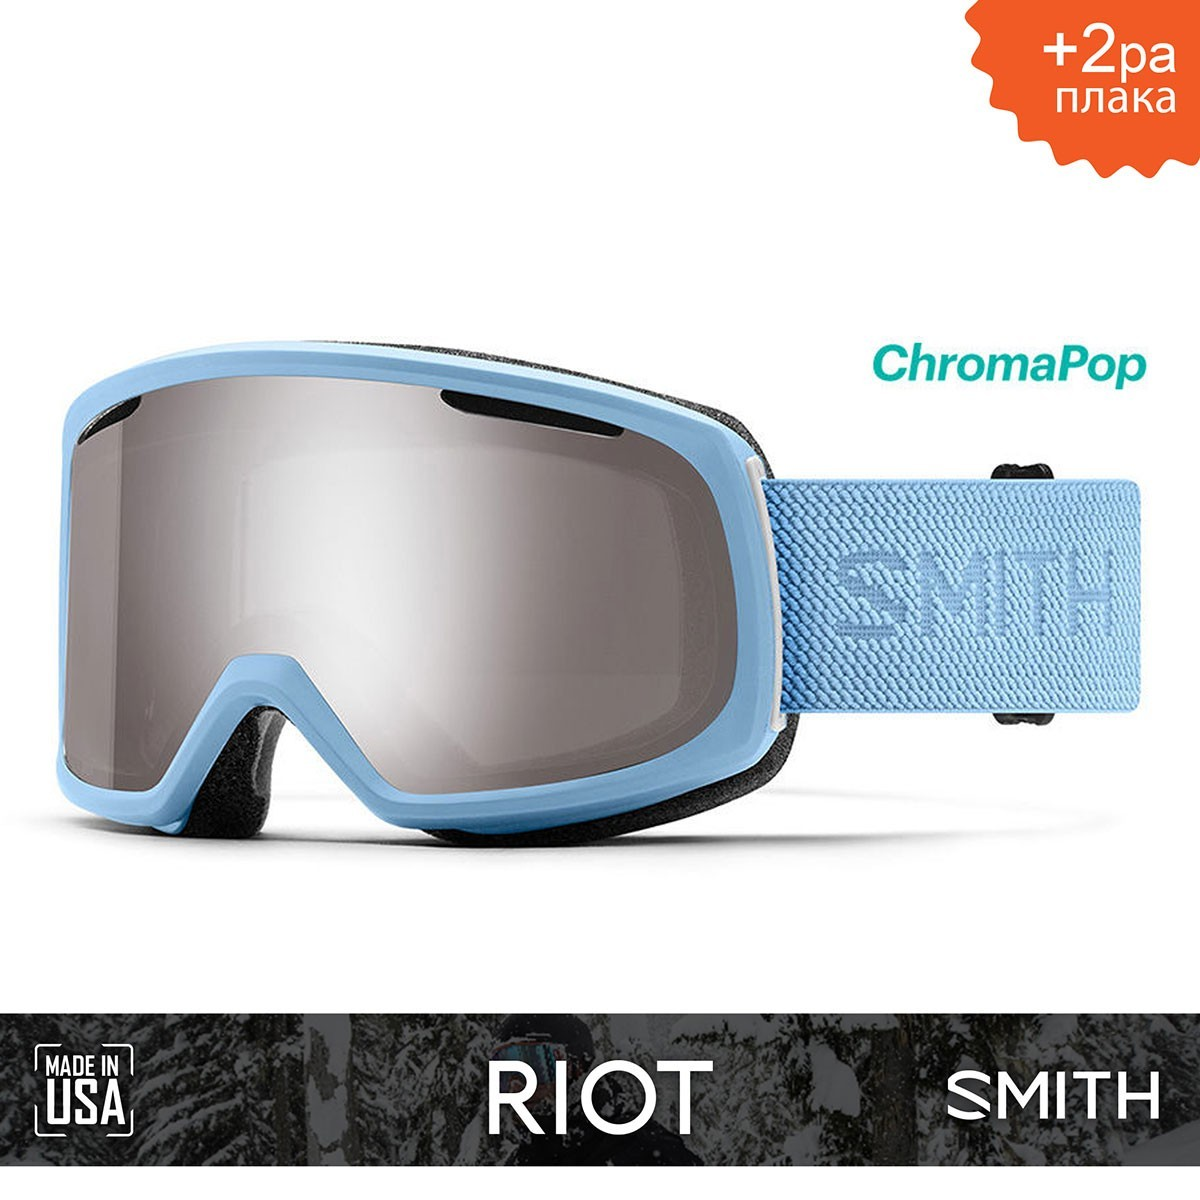 SMITH RIOT Smokey Blue | S3 CHROMAPOP Sun Platinum Mirror - Изображение - AQUAMATRIX